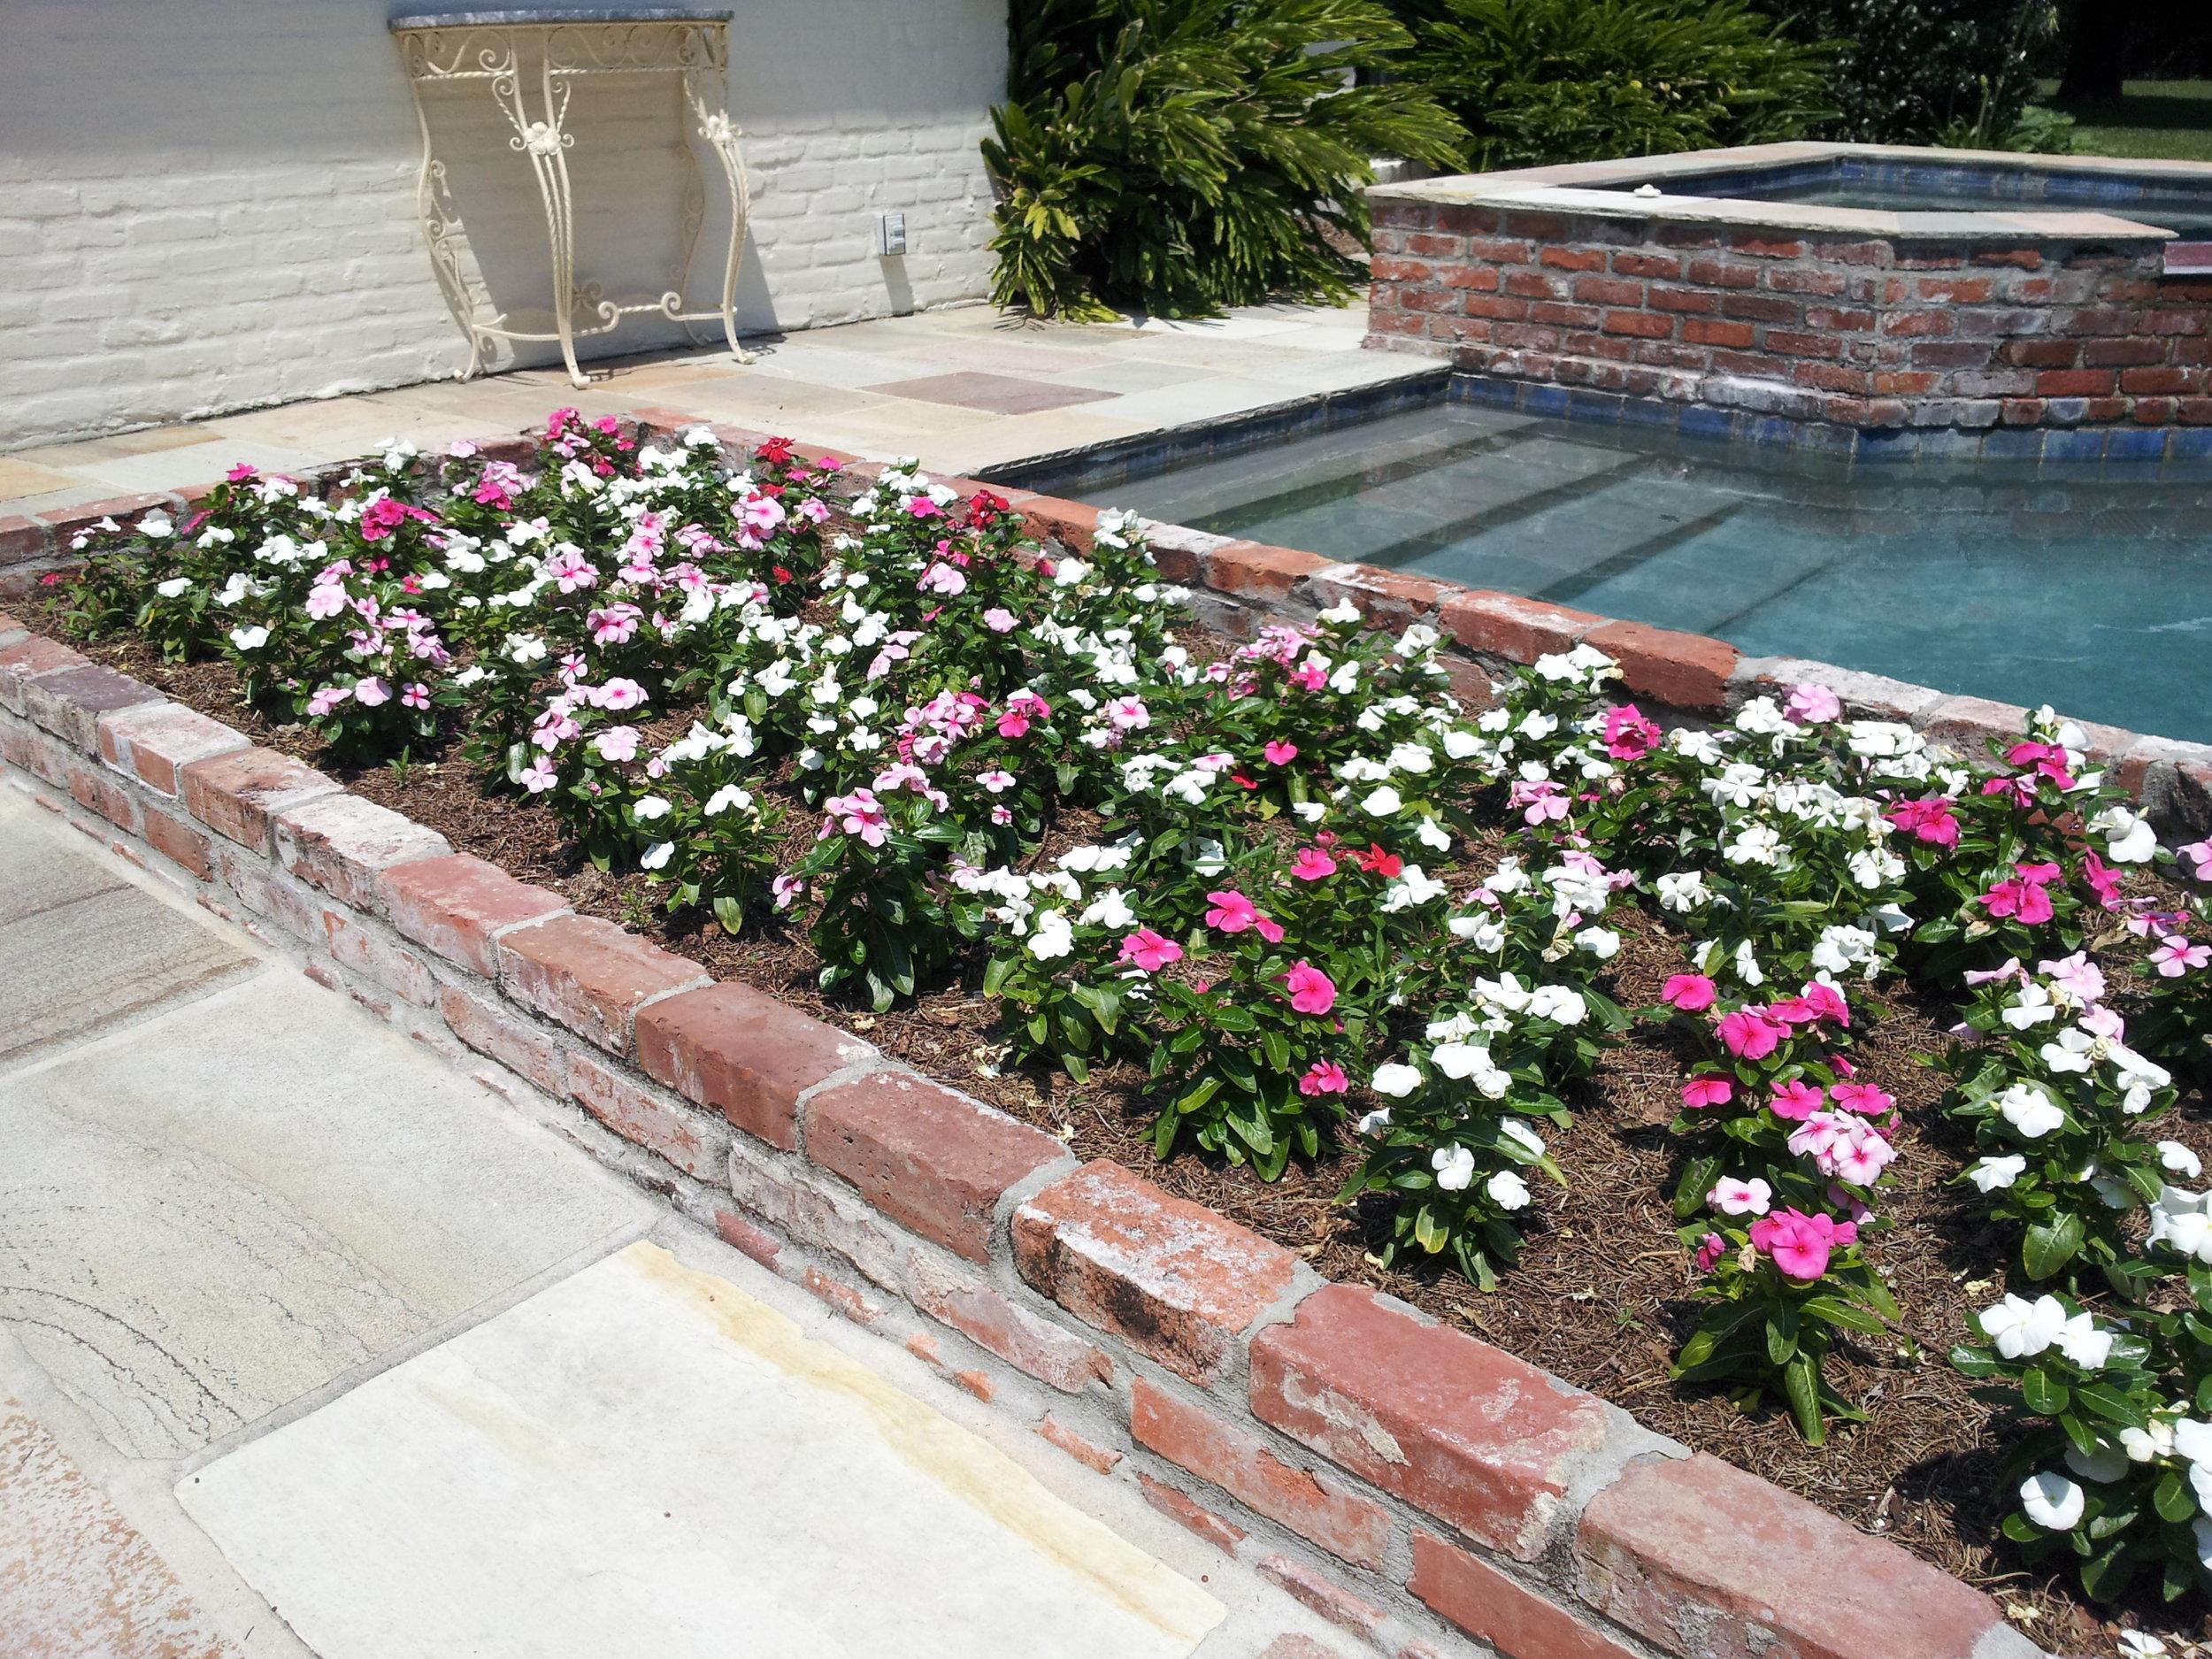 flowerbed-maintenance-seasonal-color-baton-rouge-area (4).jpg